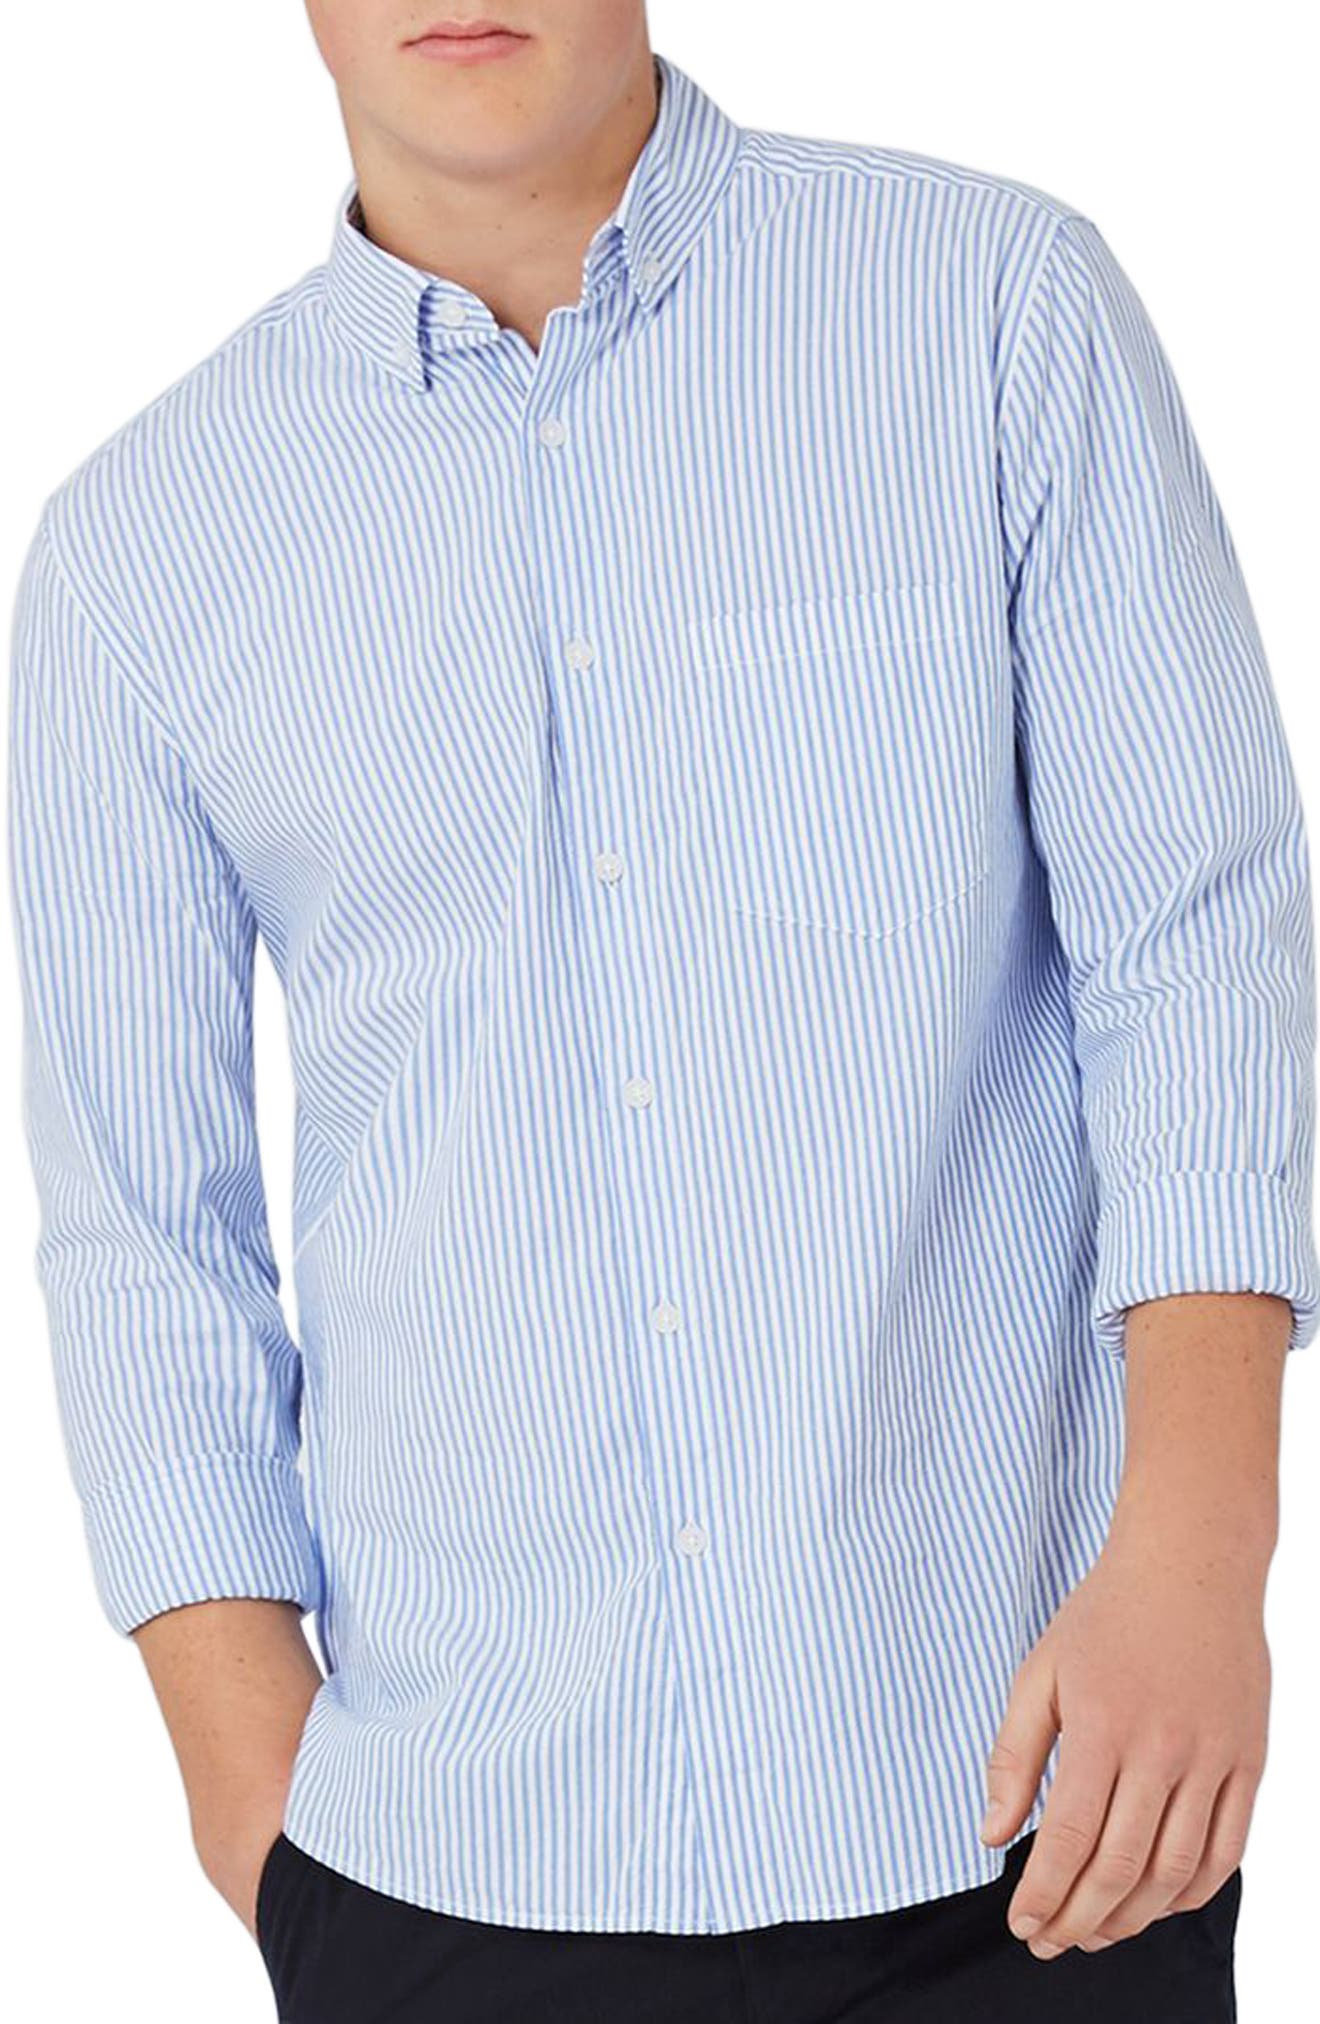 Topman Classic Fit Stripe Oxford Shirt